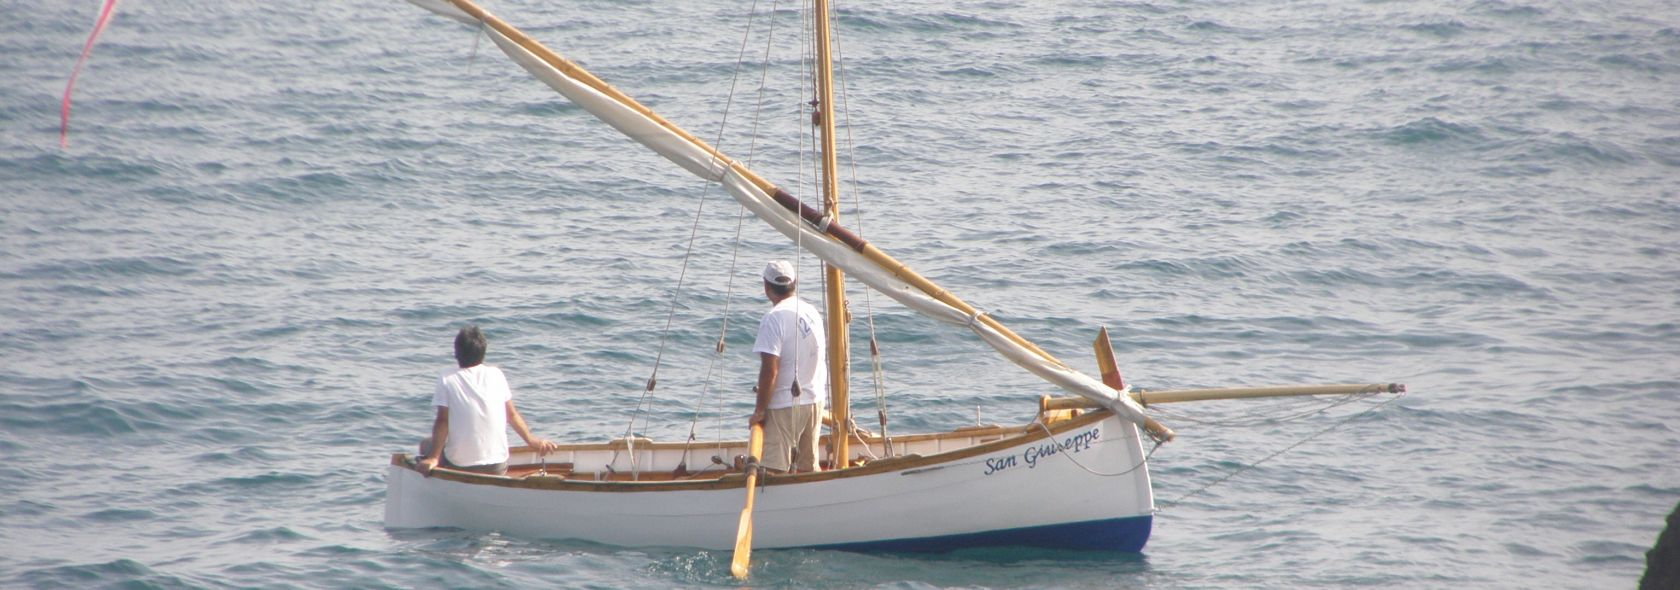 Palio Marinaro di Genova